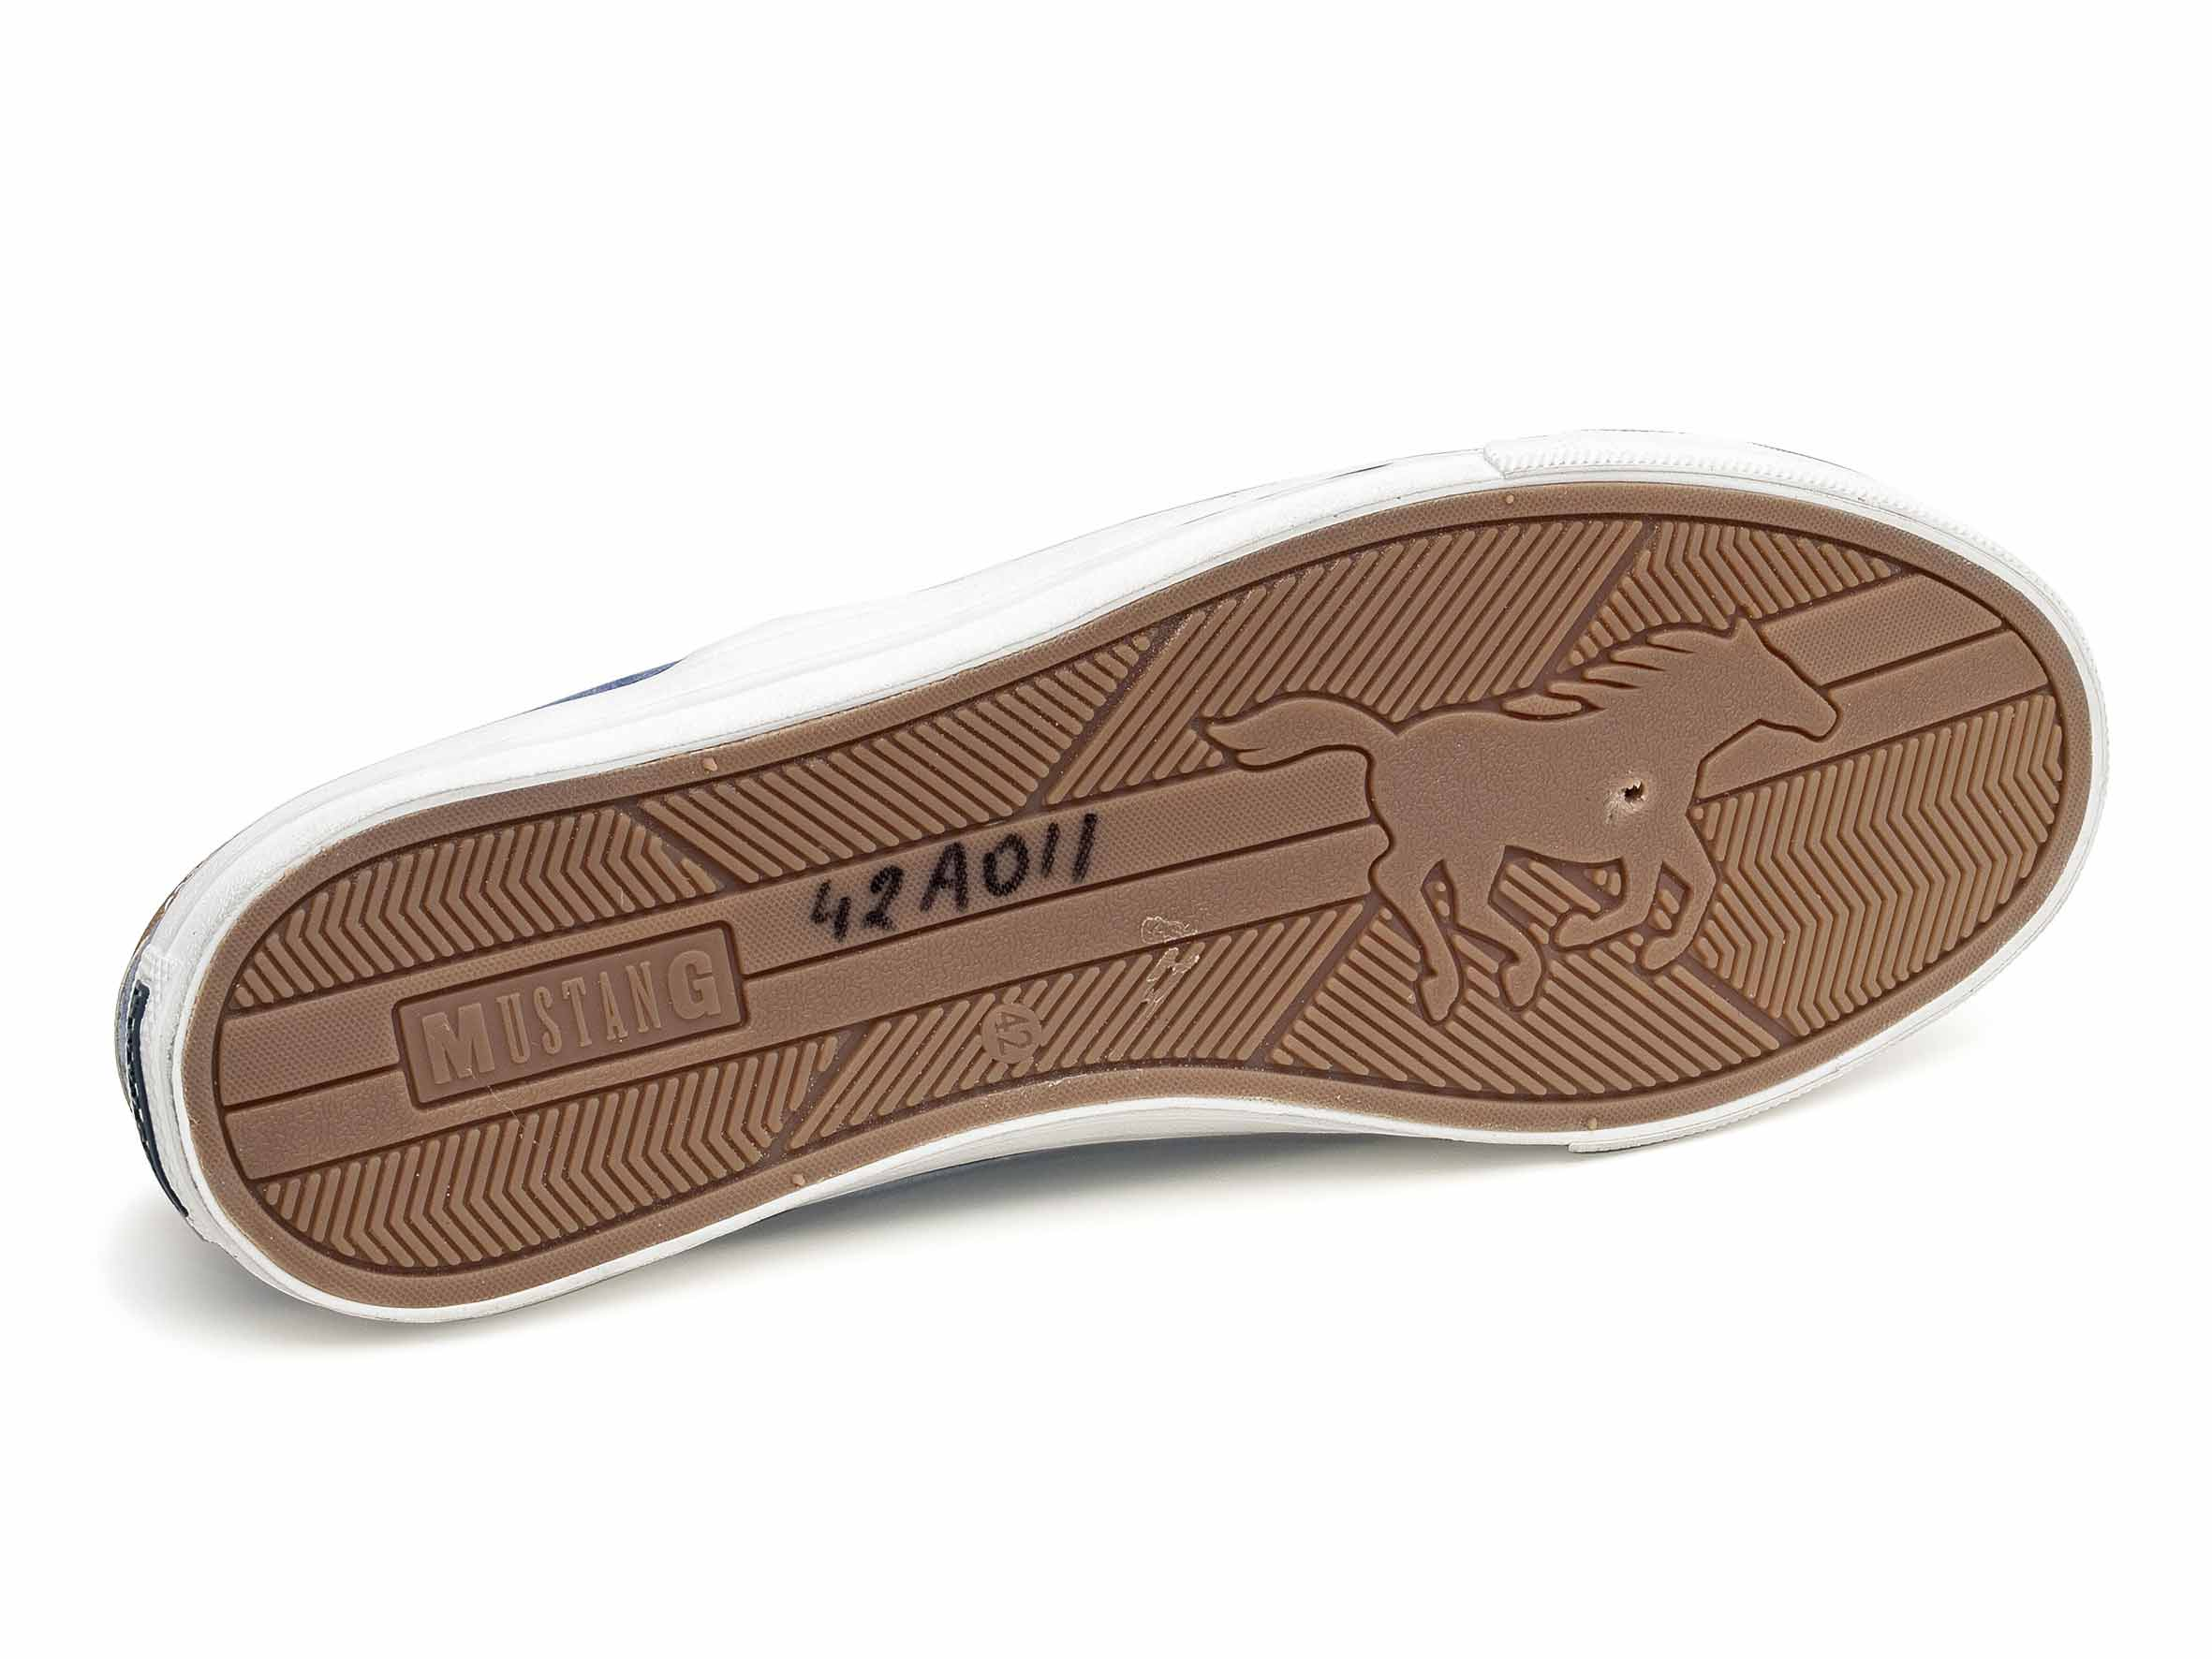 Tornacipő férfi Mustang 42A-011 (4127-401-800) mustang shoes cdf0f8a4d7